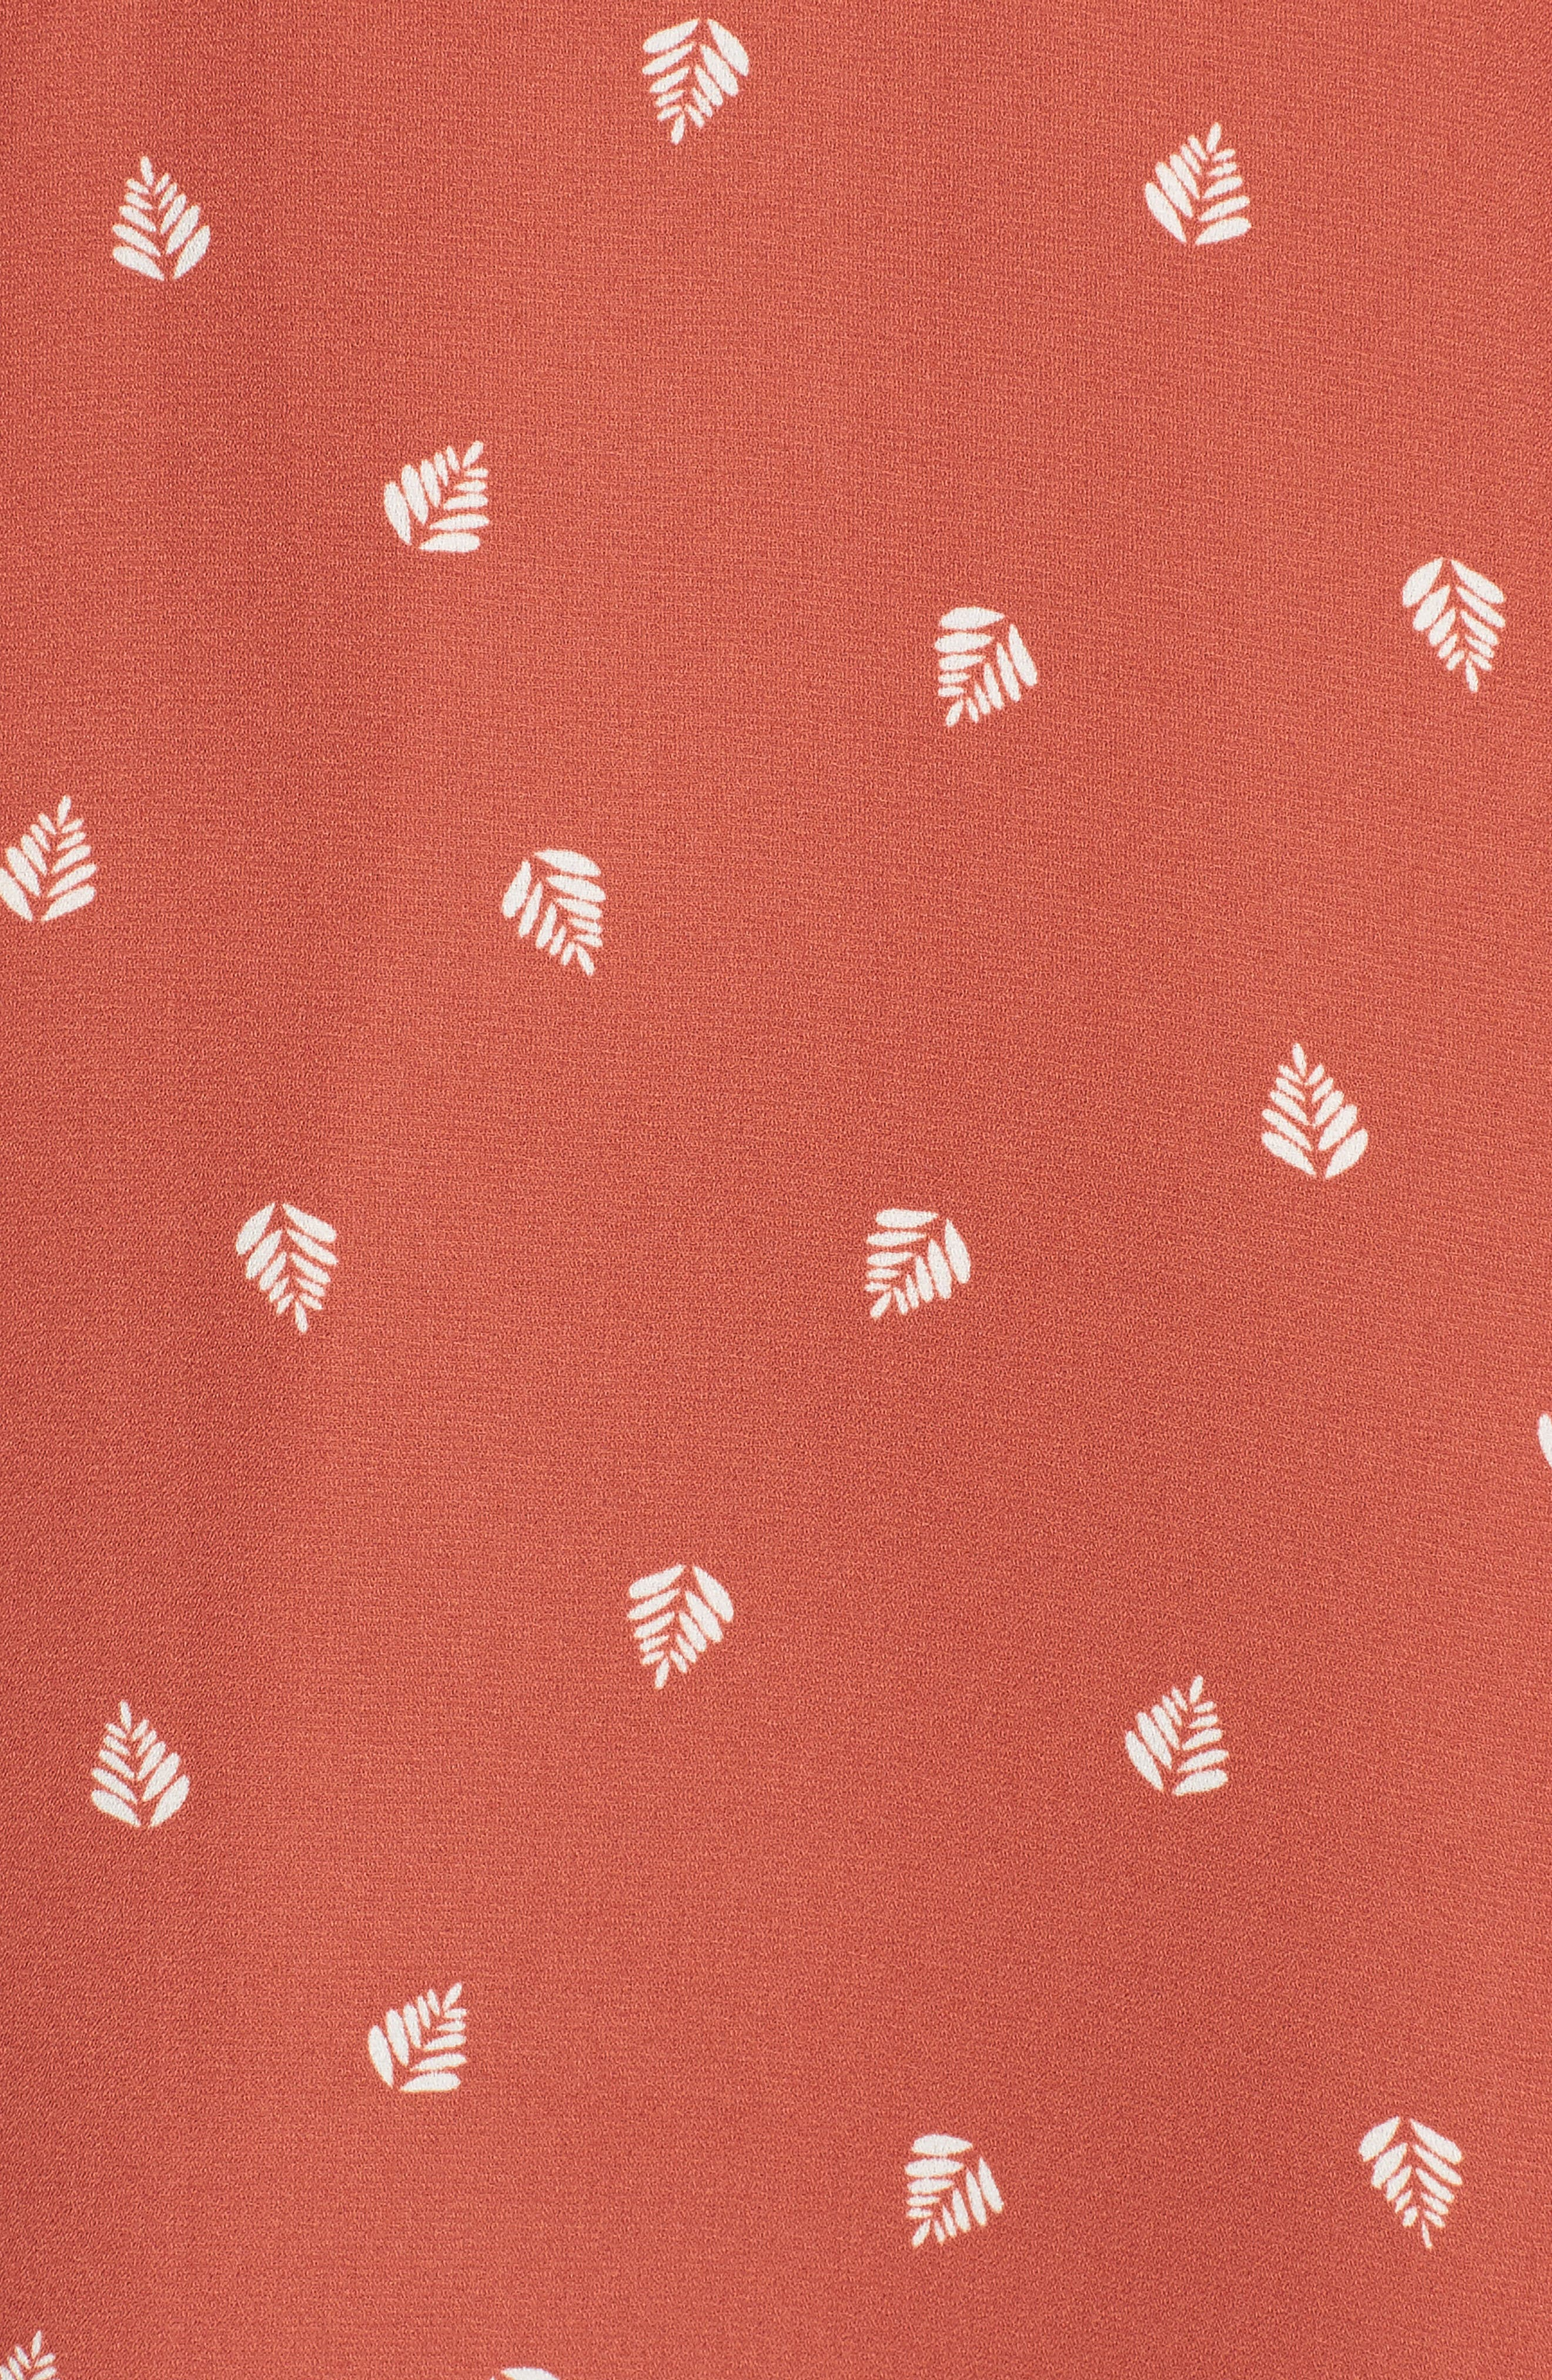 Elly Wrap Dress,                             Alternate thumbnail 60, color,